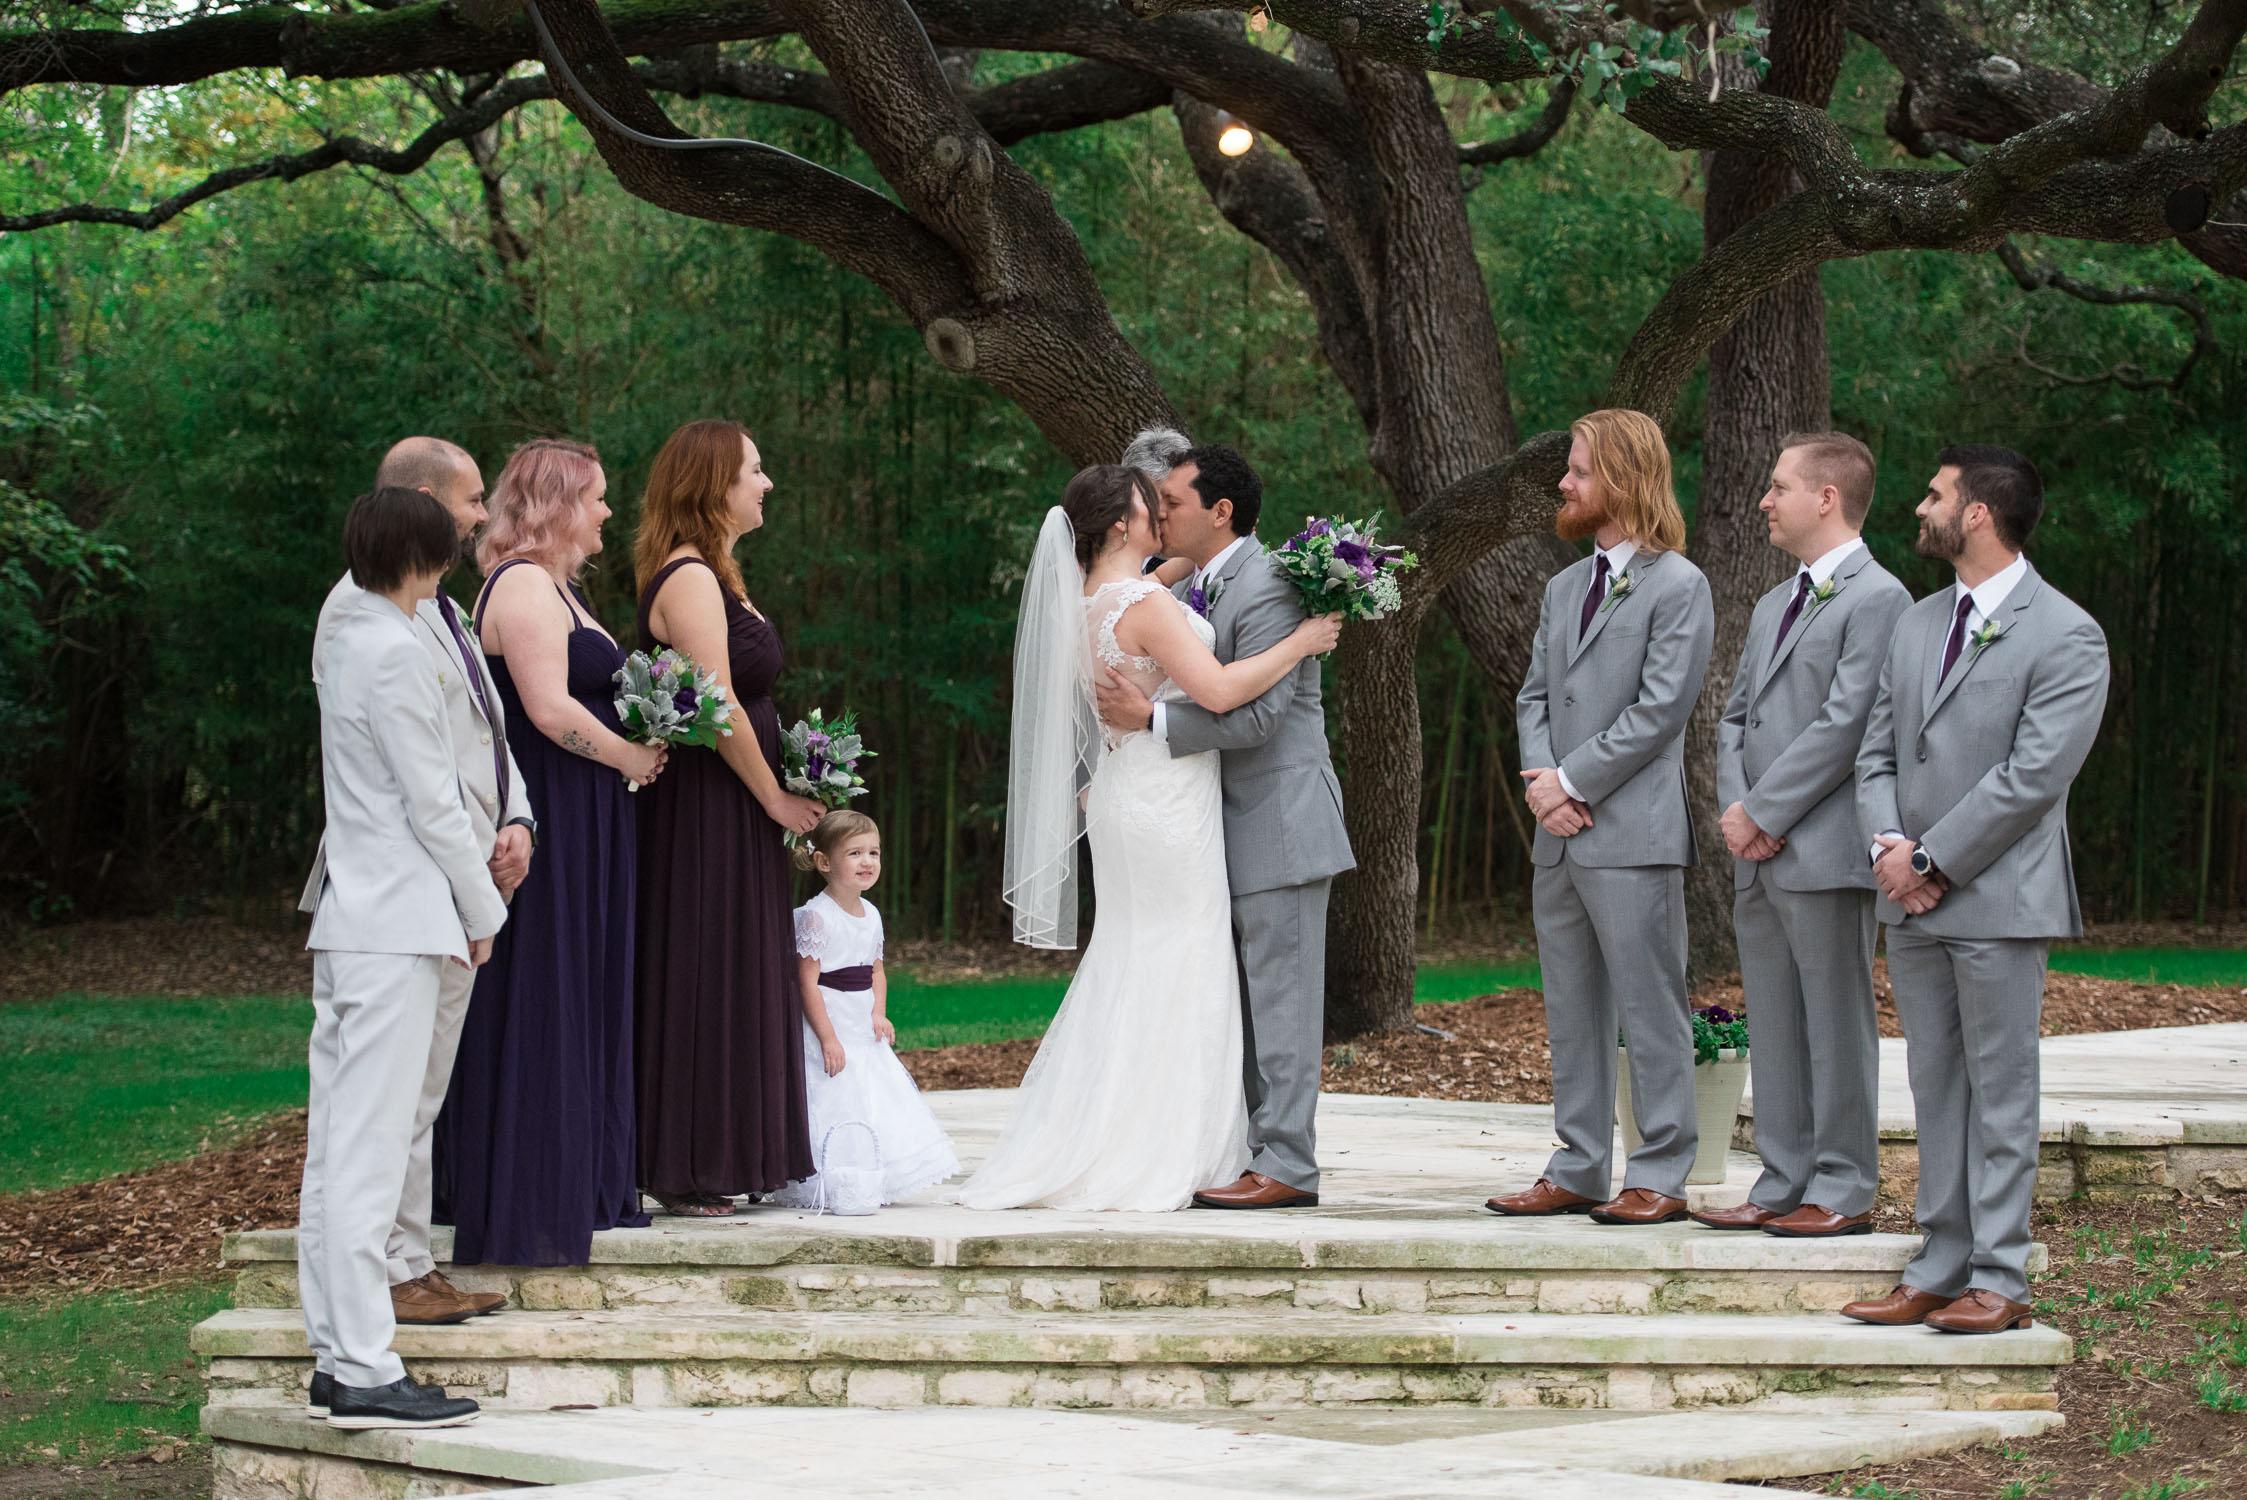 Alex and Austin Wedding Photography at Mercury Hall in Texas-87.jpg